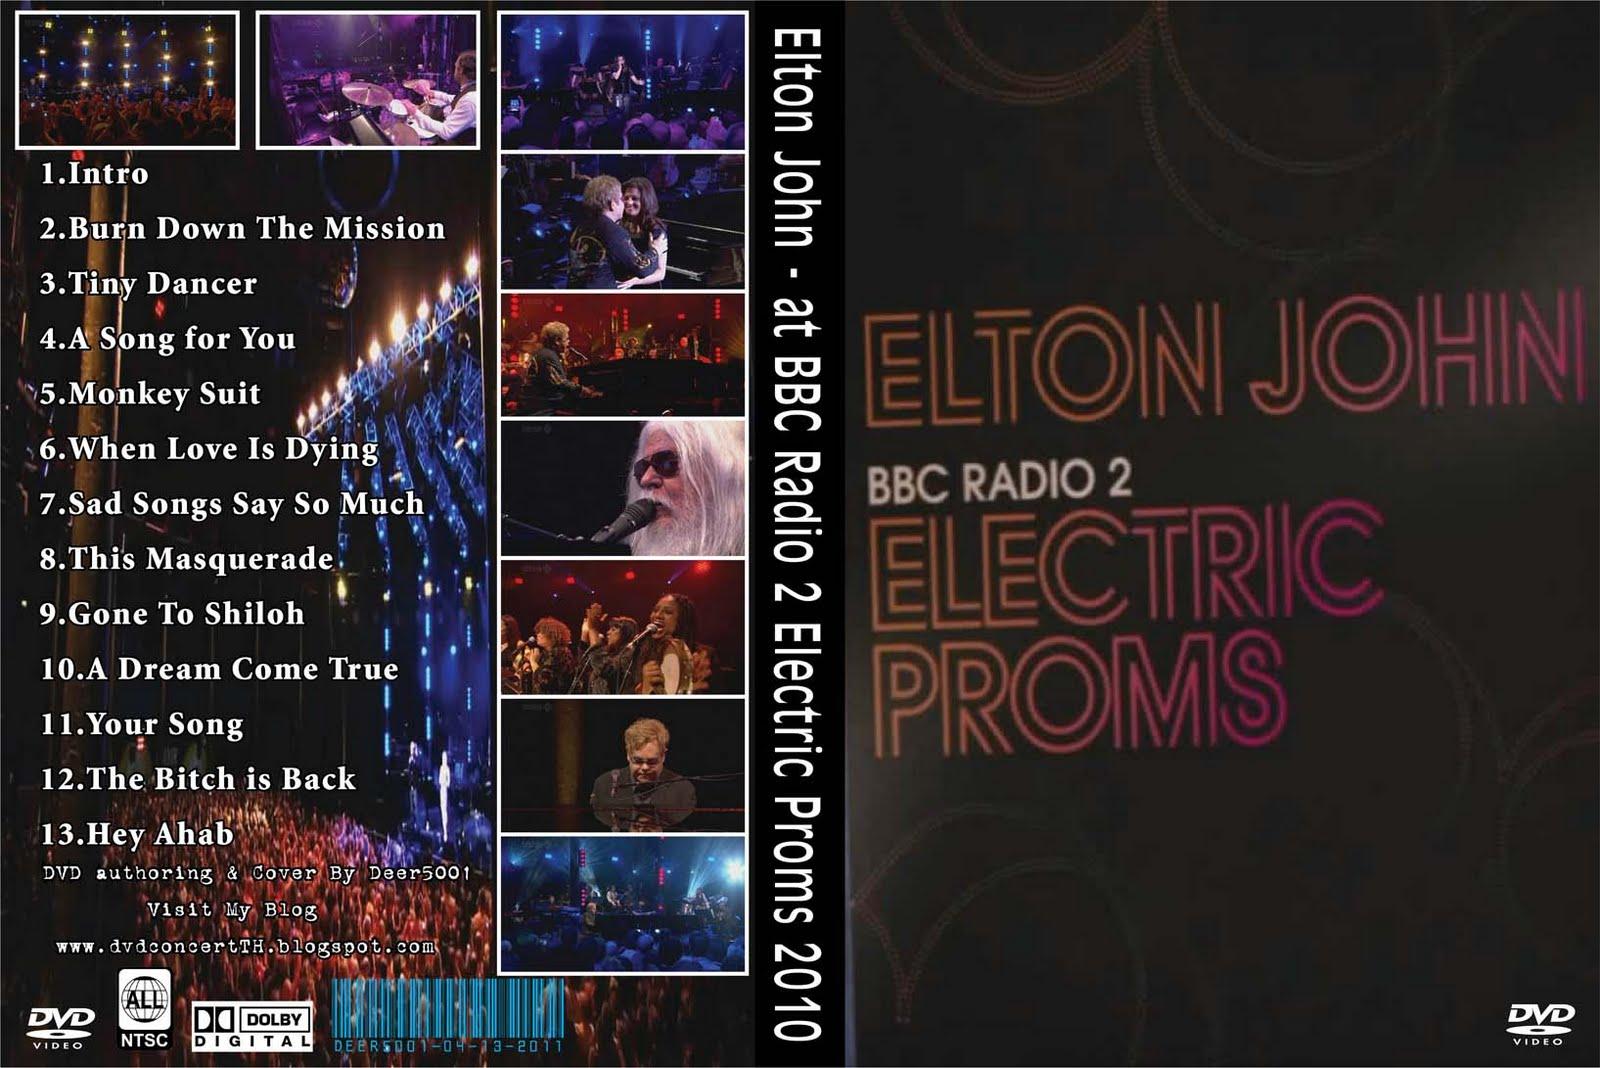 http://2.bp.blogspot.com/-IrmUClxThVU/TagL3nK3CzI/AAAAAAAAChM/eUricyhWc3s/s1600/DVD+Cover+Low+Quality+-+Elton+John+-+BBC+Radio+2+-+Electric+Proms+-+2010.jpg